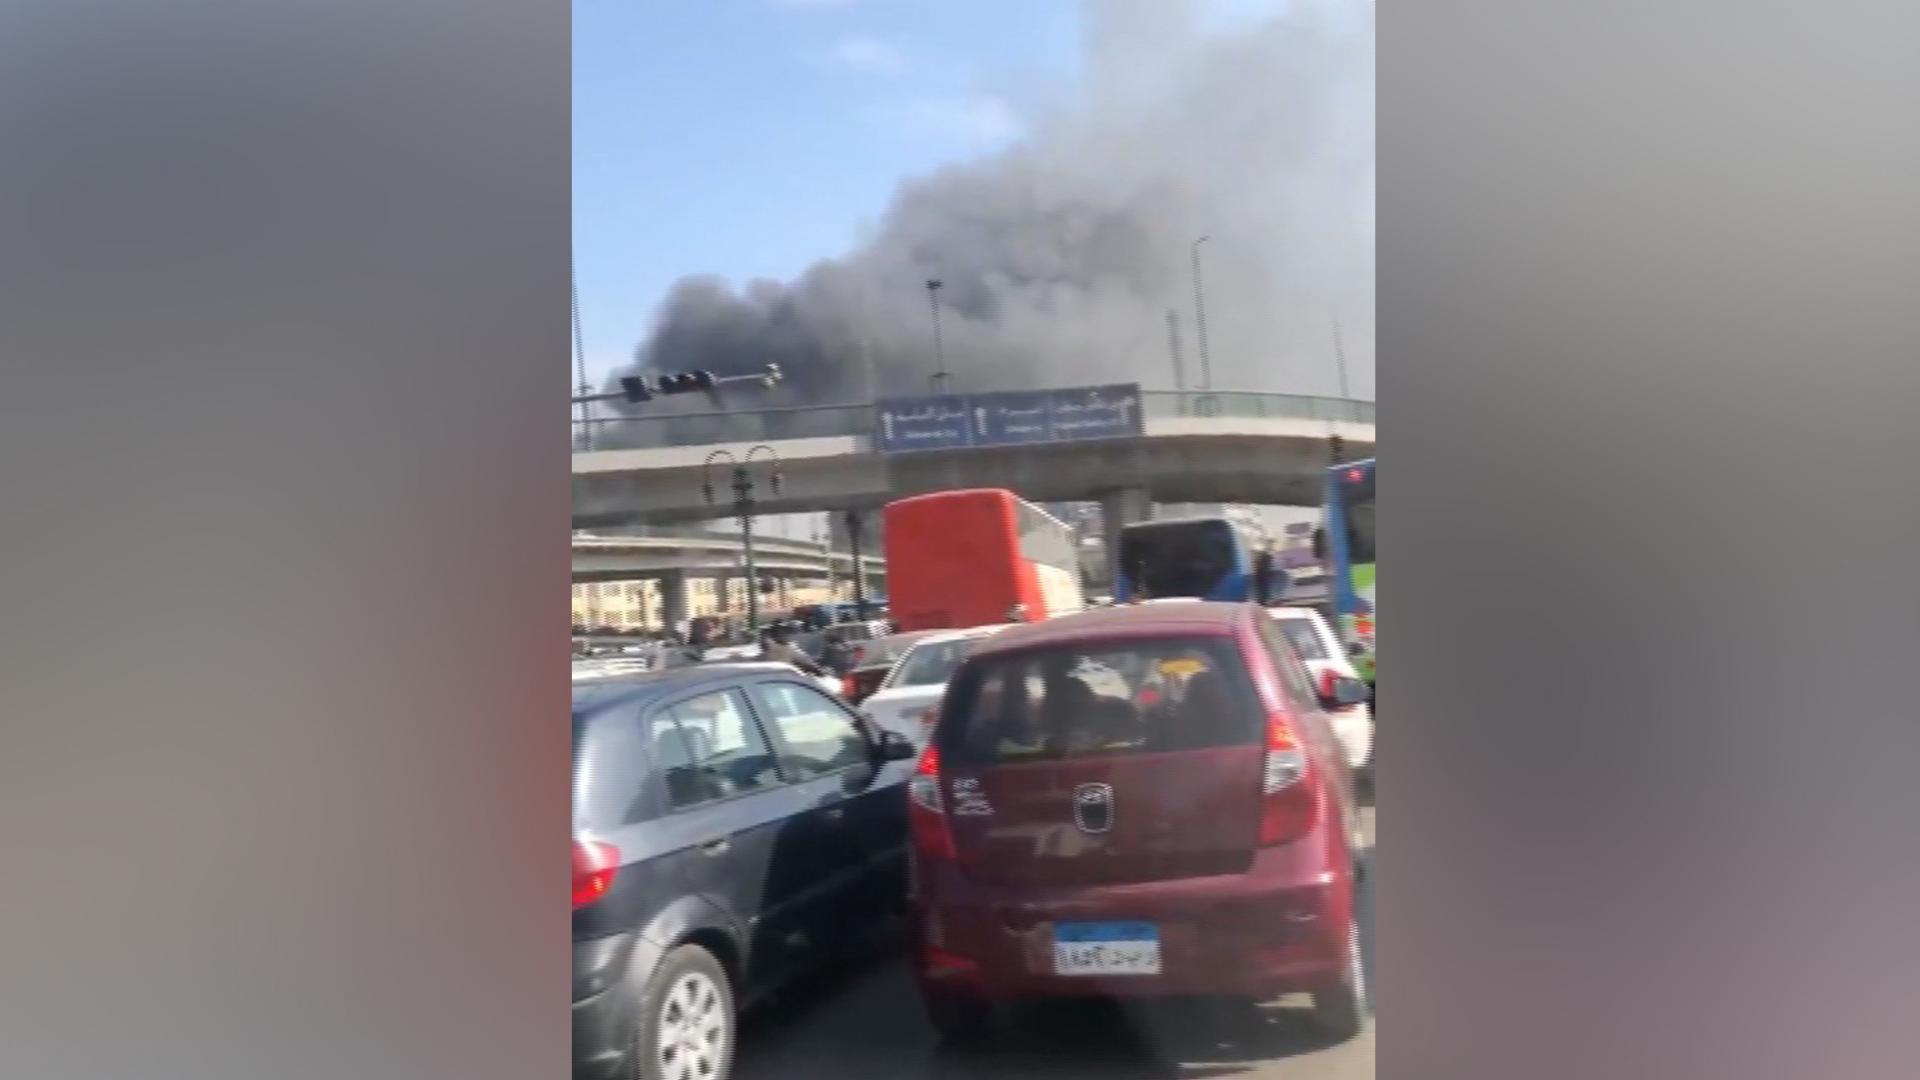 تلفزيون مصر: 20 قتيلا و40 مصابا بحريق محطة قطارات